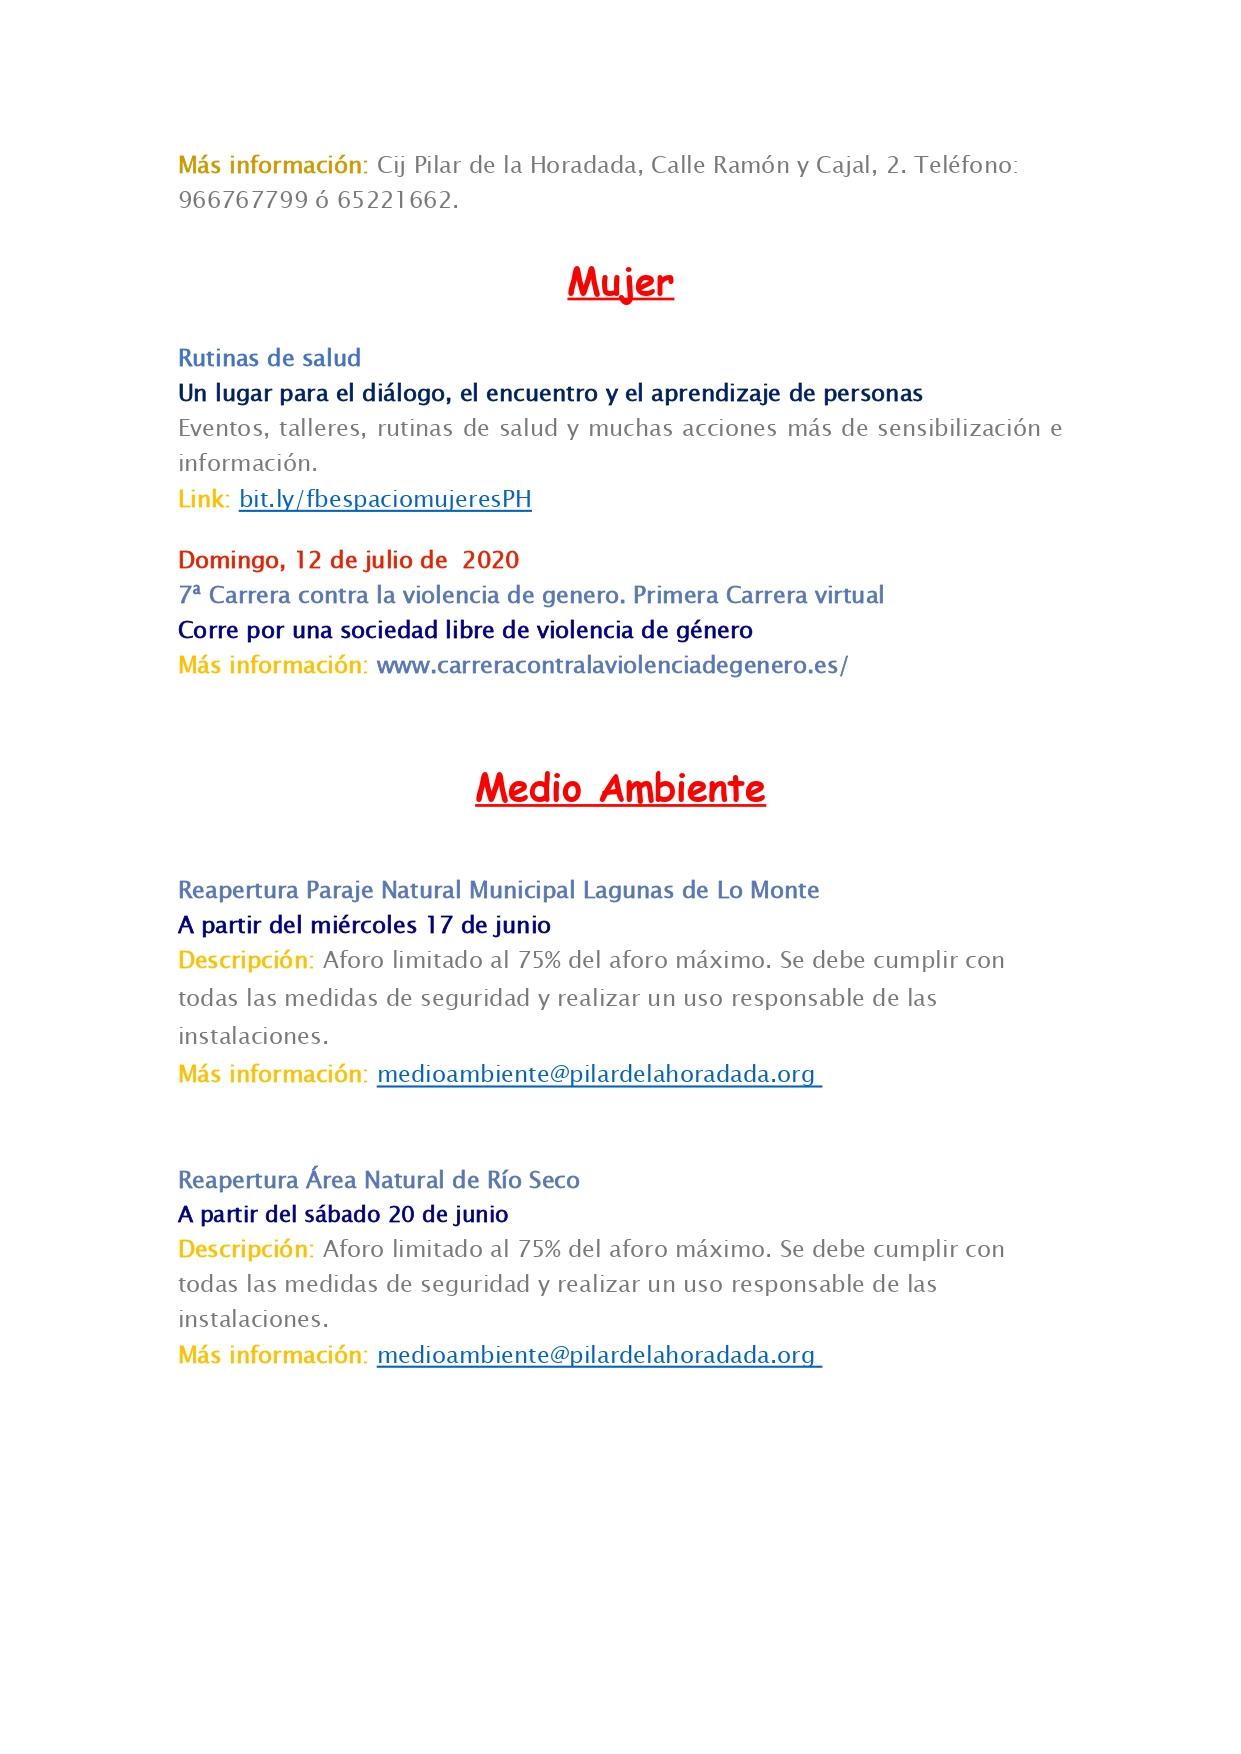 AGENDA_DE_EVENTOS_especial_PilardelaHoradadaTeEspera_25_junio_page-0003.jpg